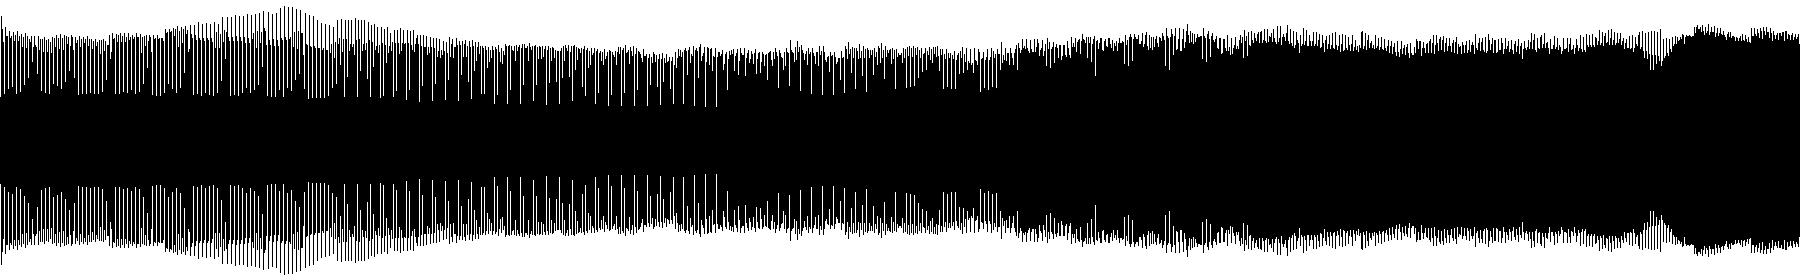 95 c 3